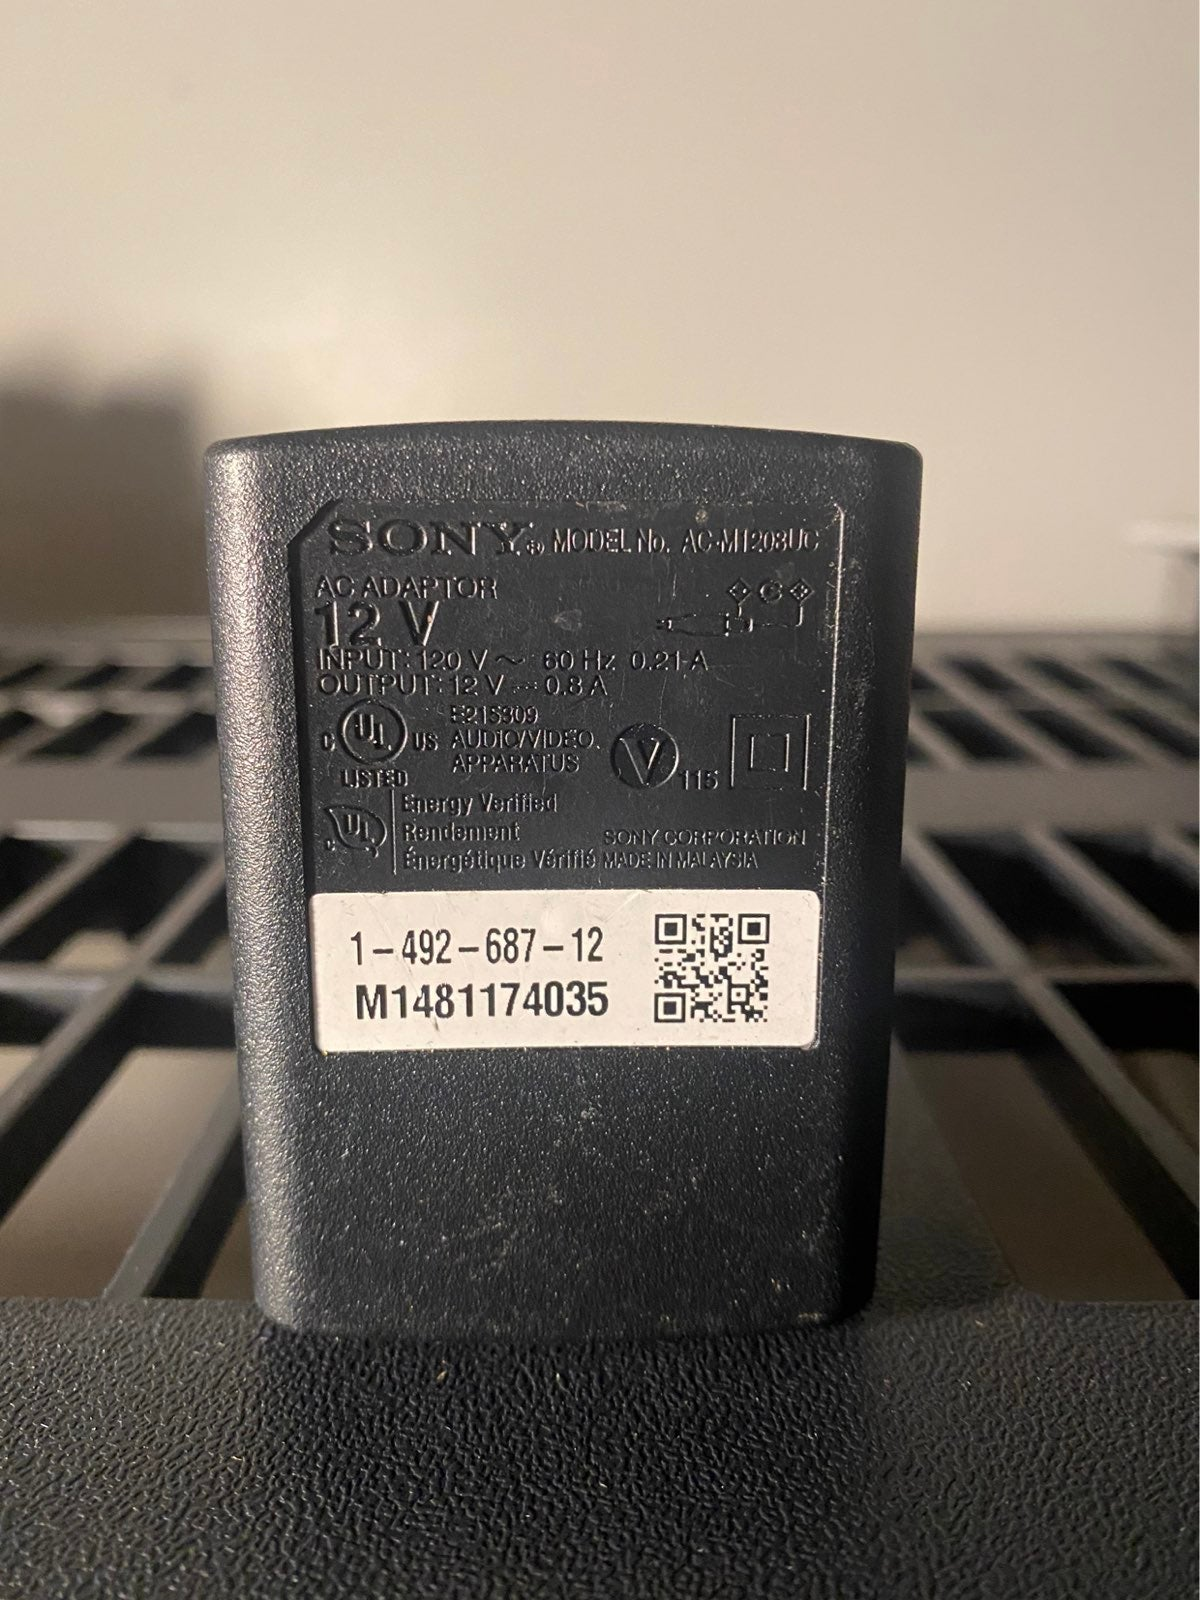 Sony 12V Adapter AC-M1208UC